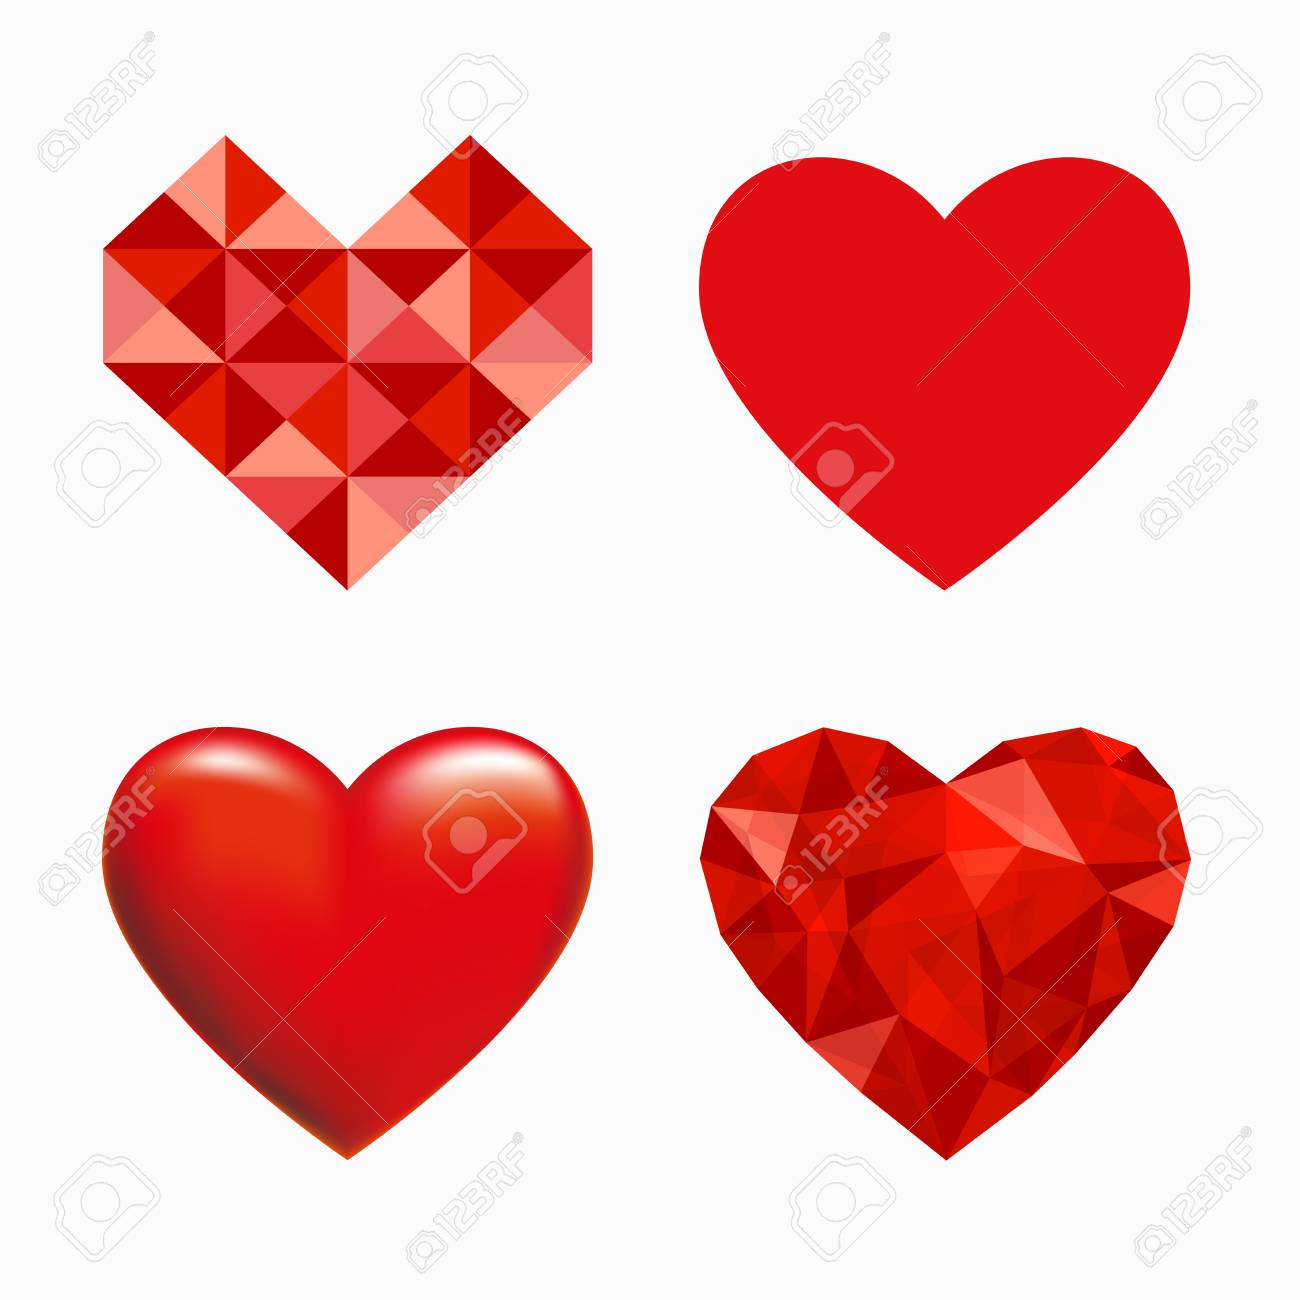 Heart symbols royalty free cliparts vectors and stock illustration heart symbols stock vector 76489599 buycottarizona Gallery